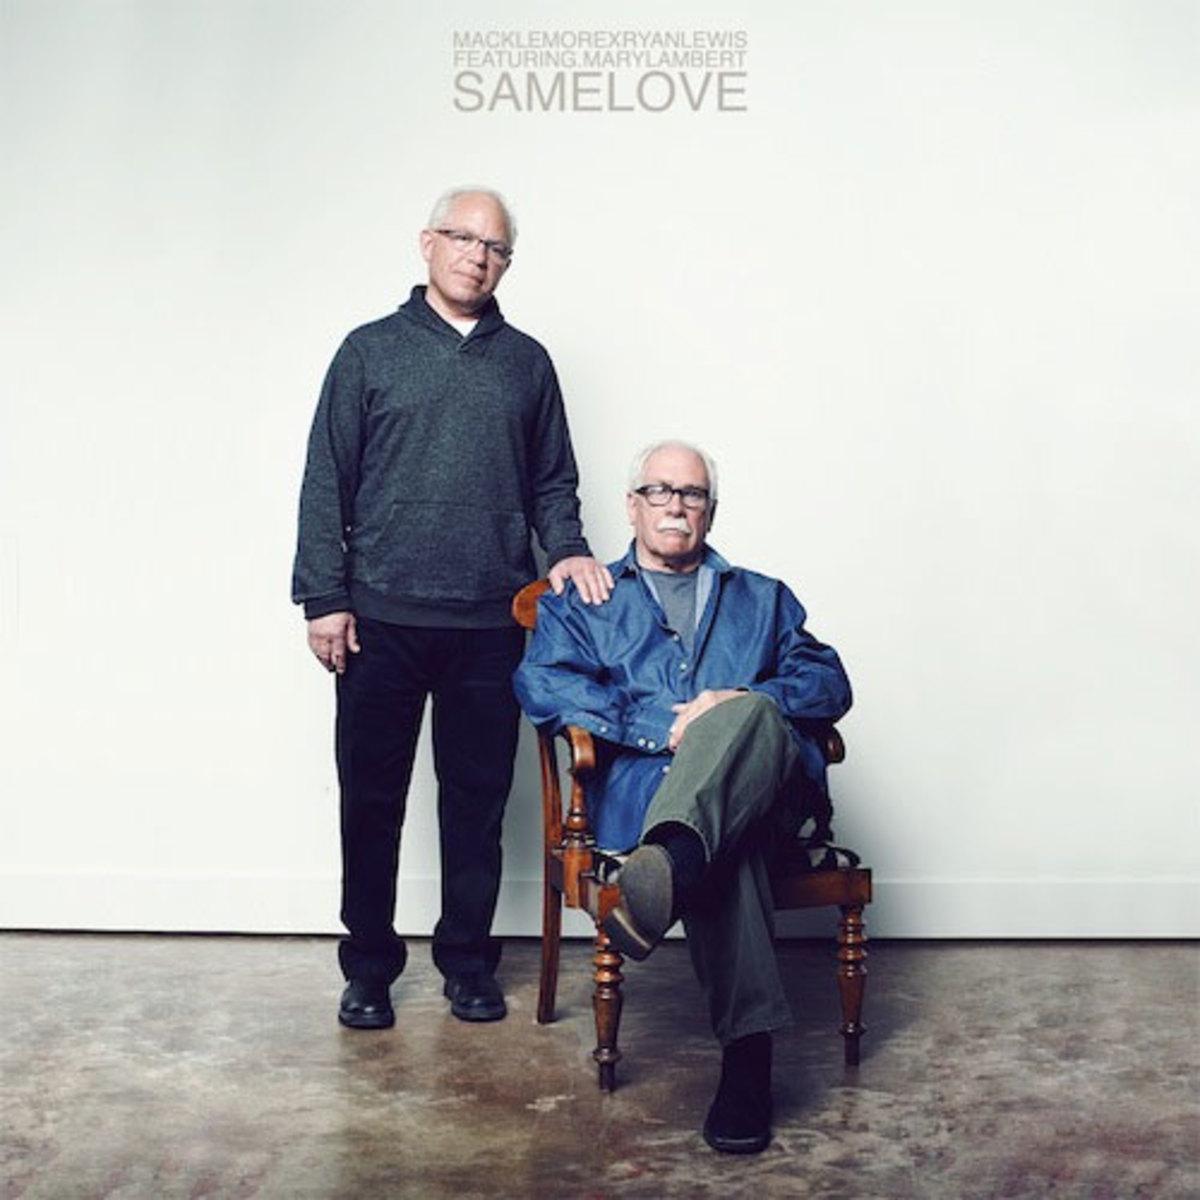 macklemore-samelove.jpg